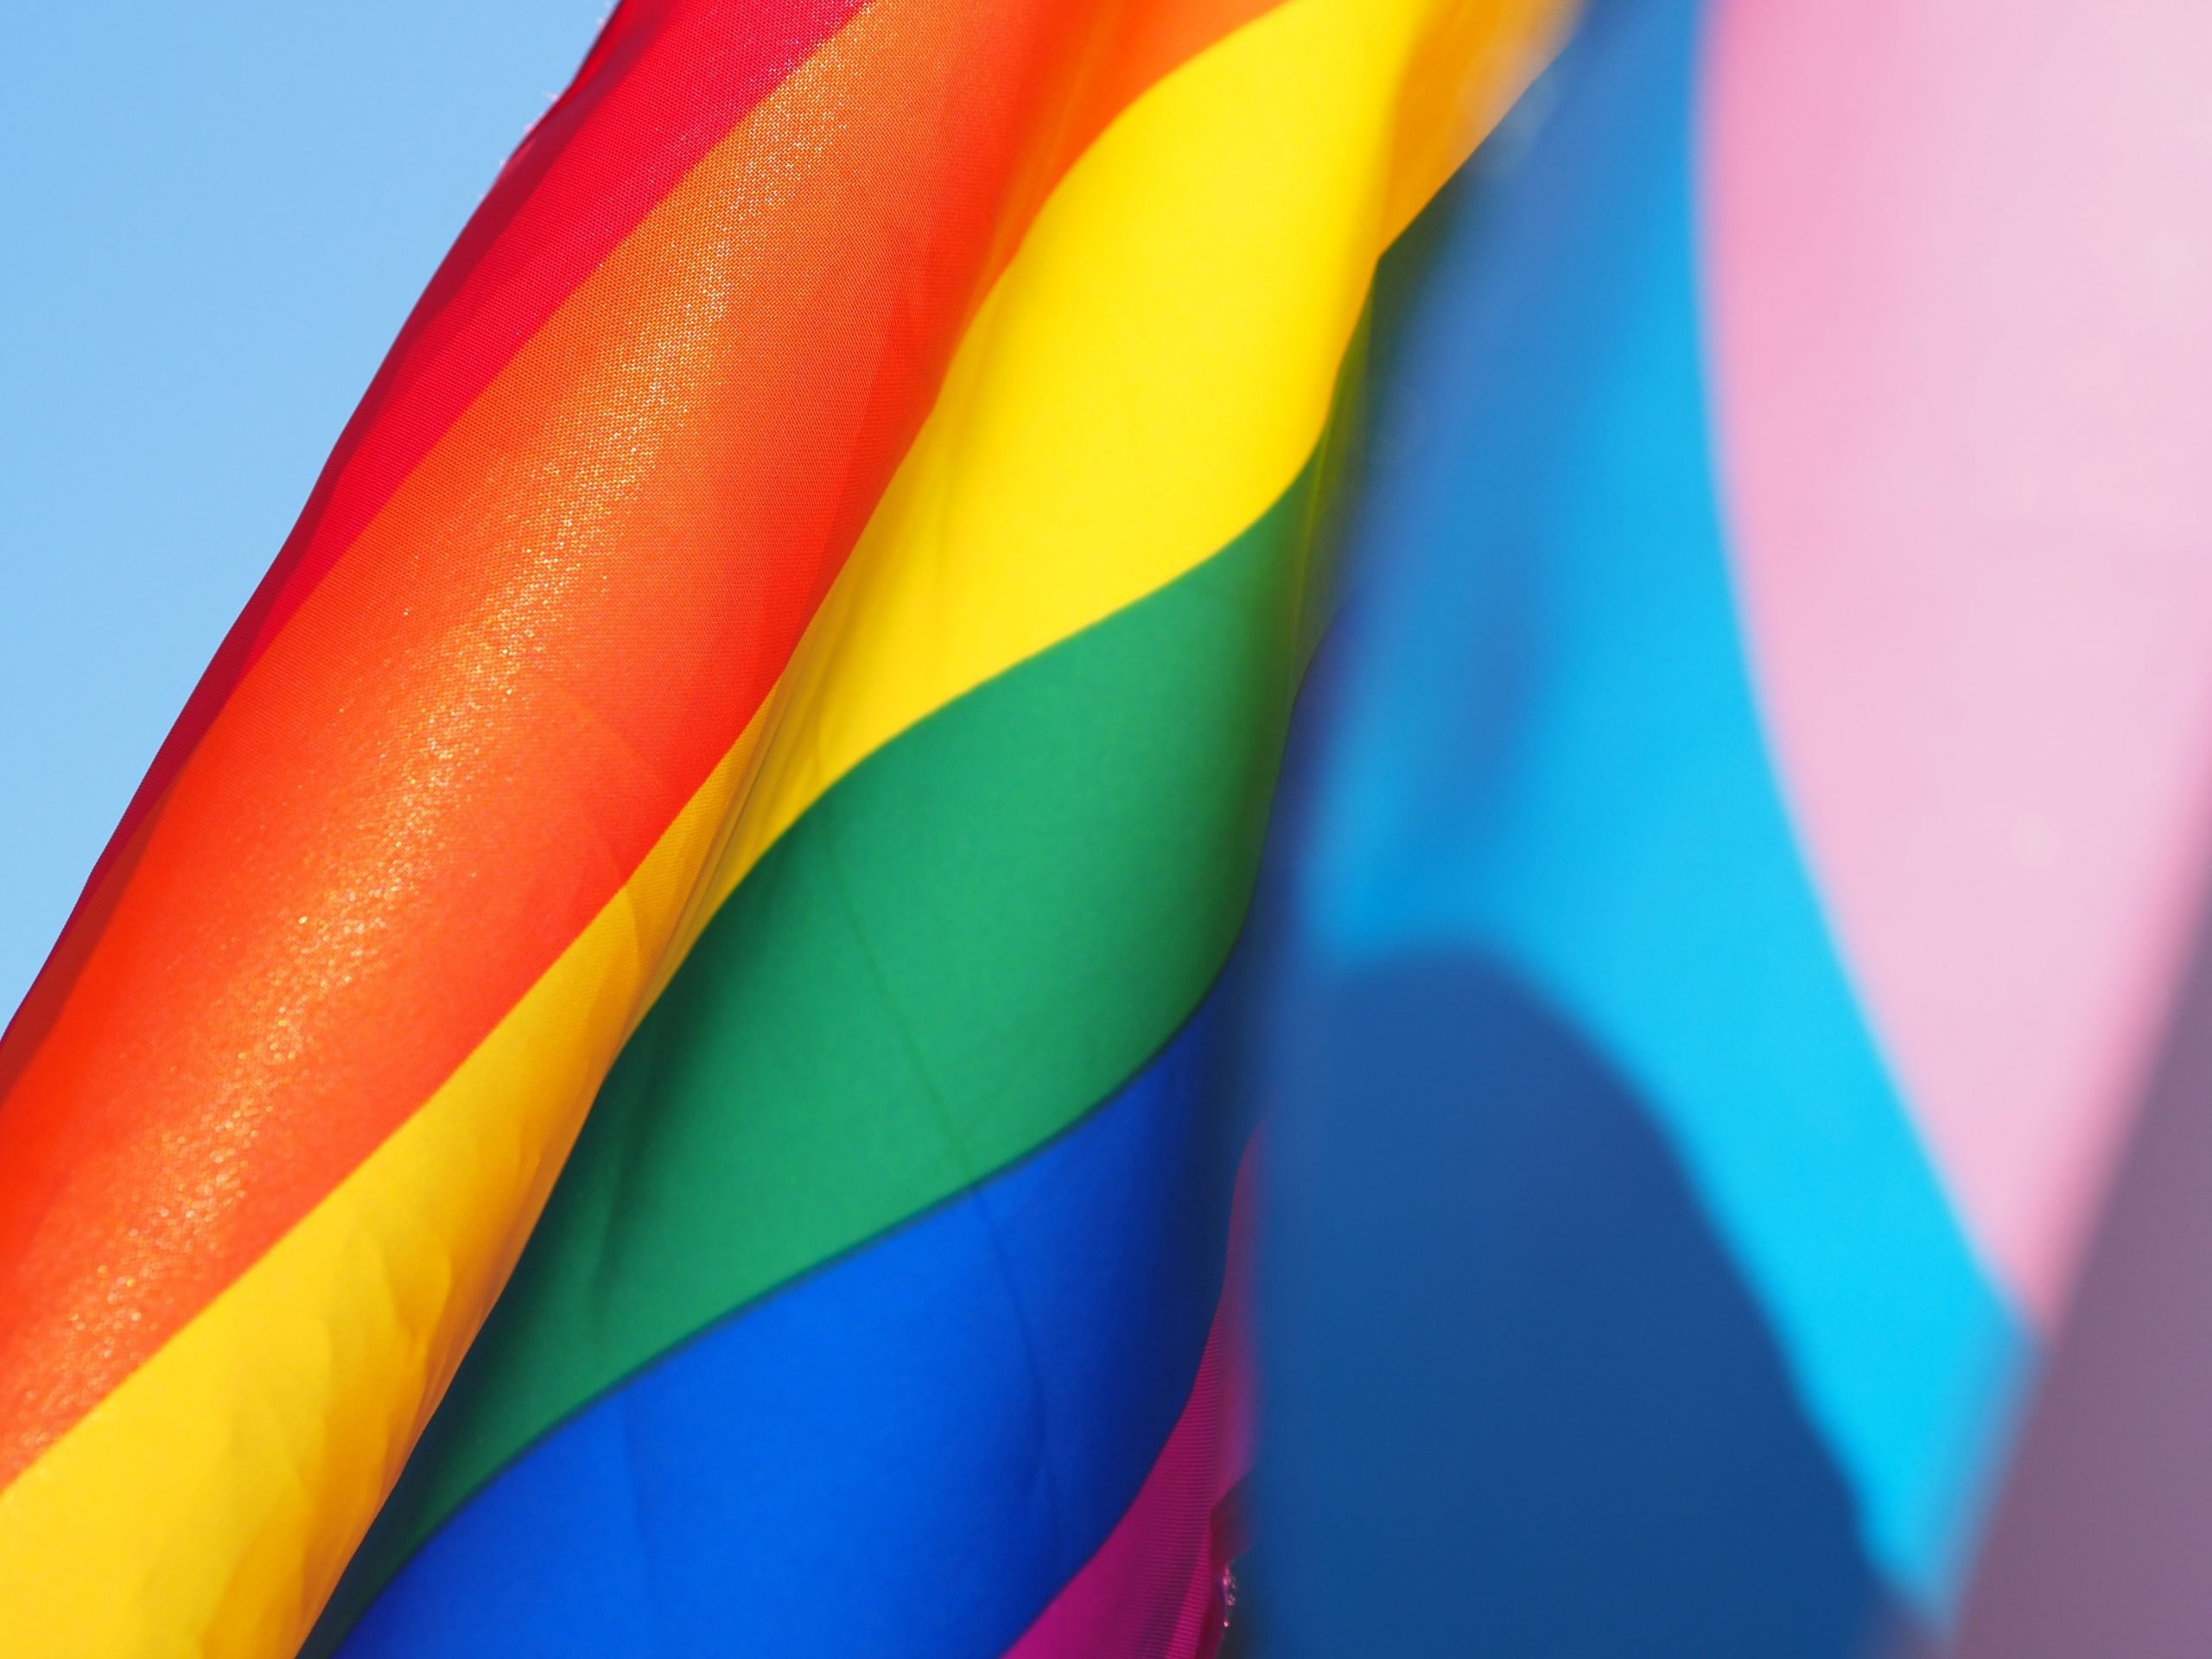 Eco-pride: How to celebrate Pride 2021 sustainably